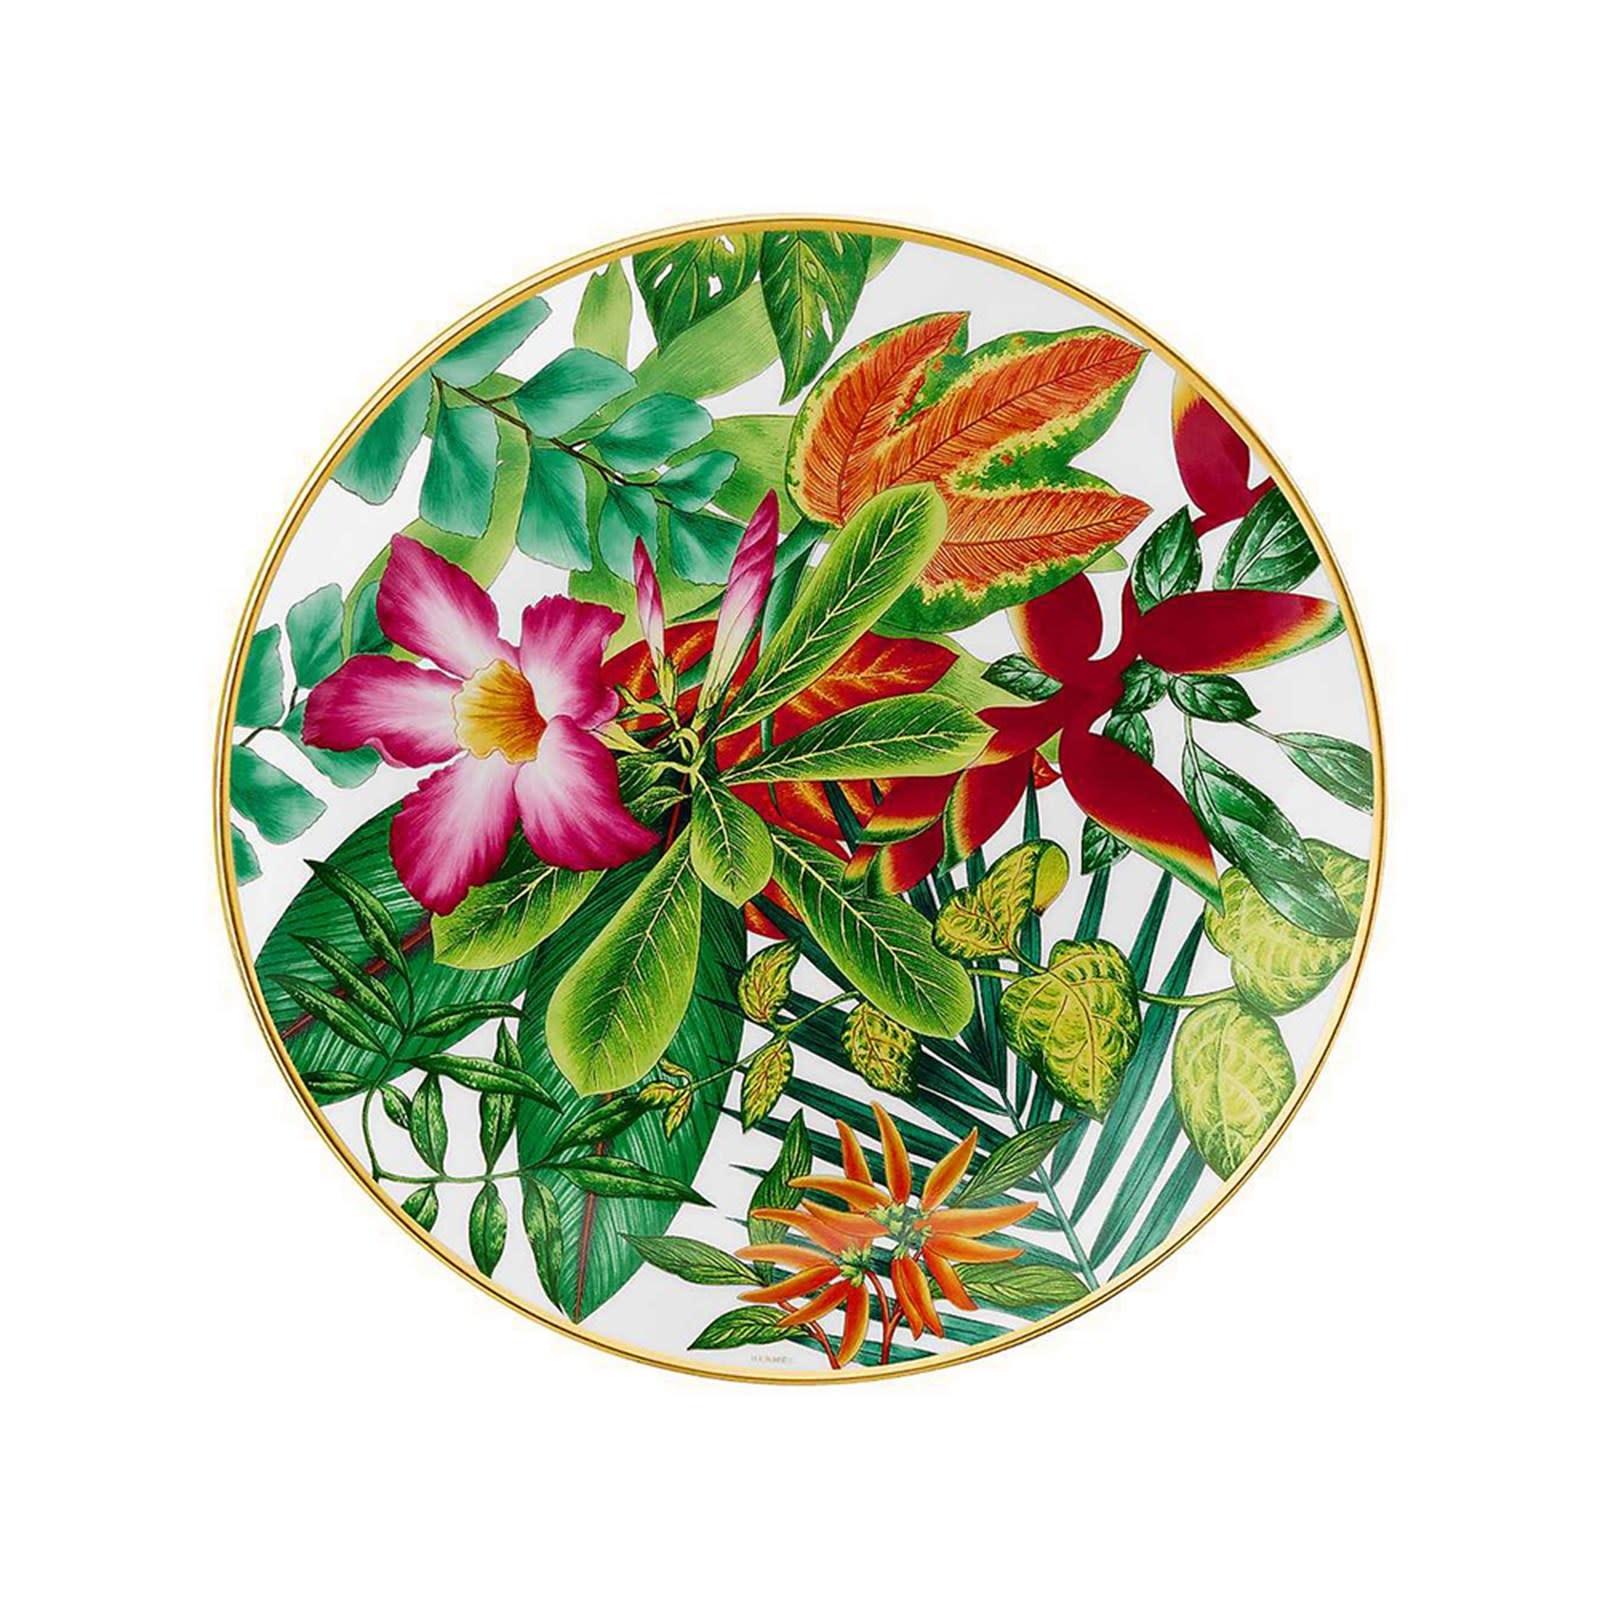 Hermes Passifolia Dessert Plate Rose No 1